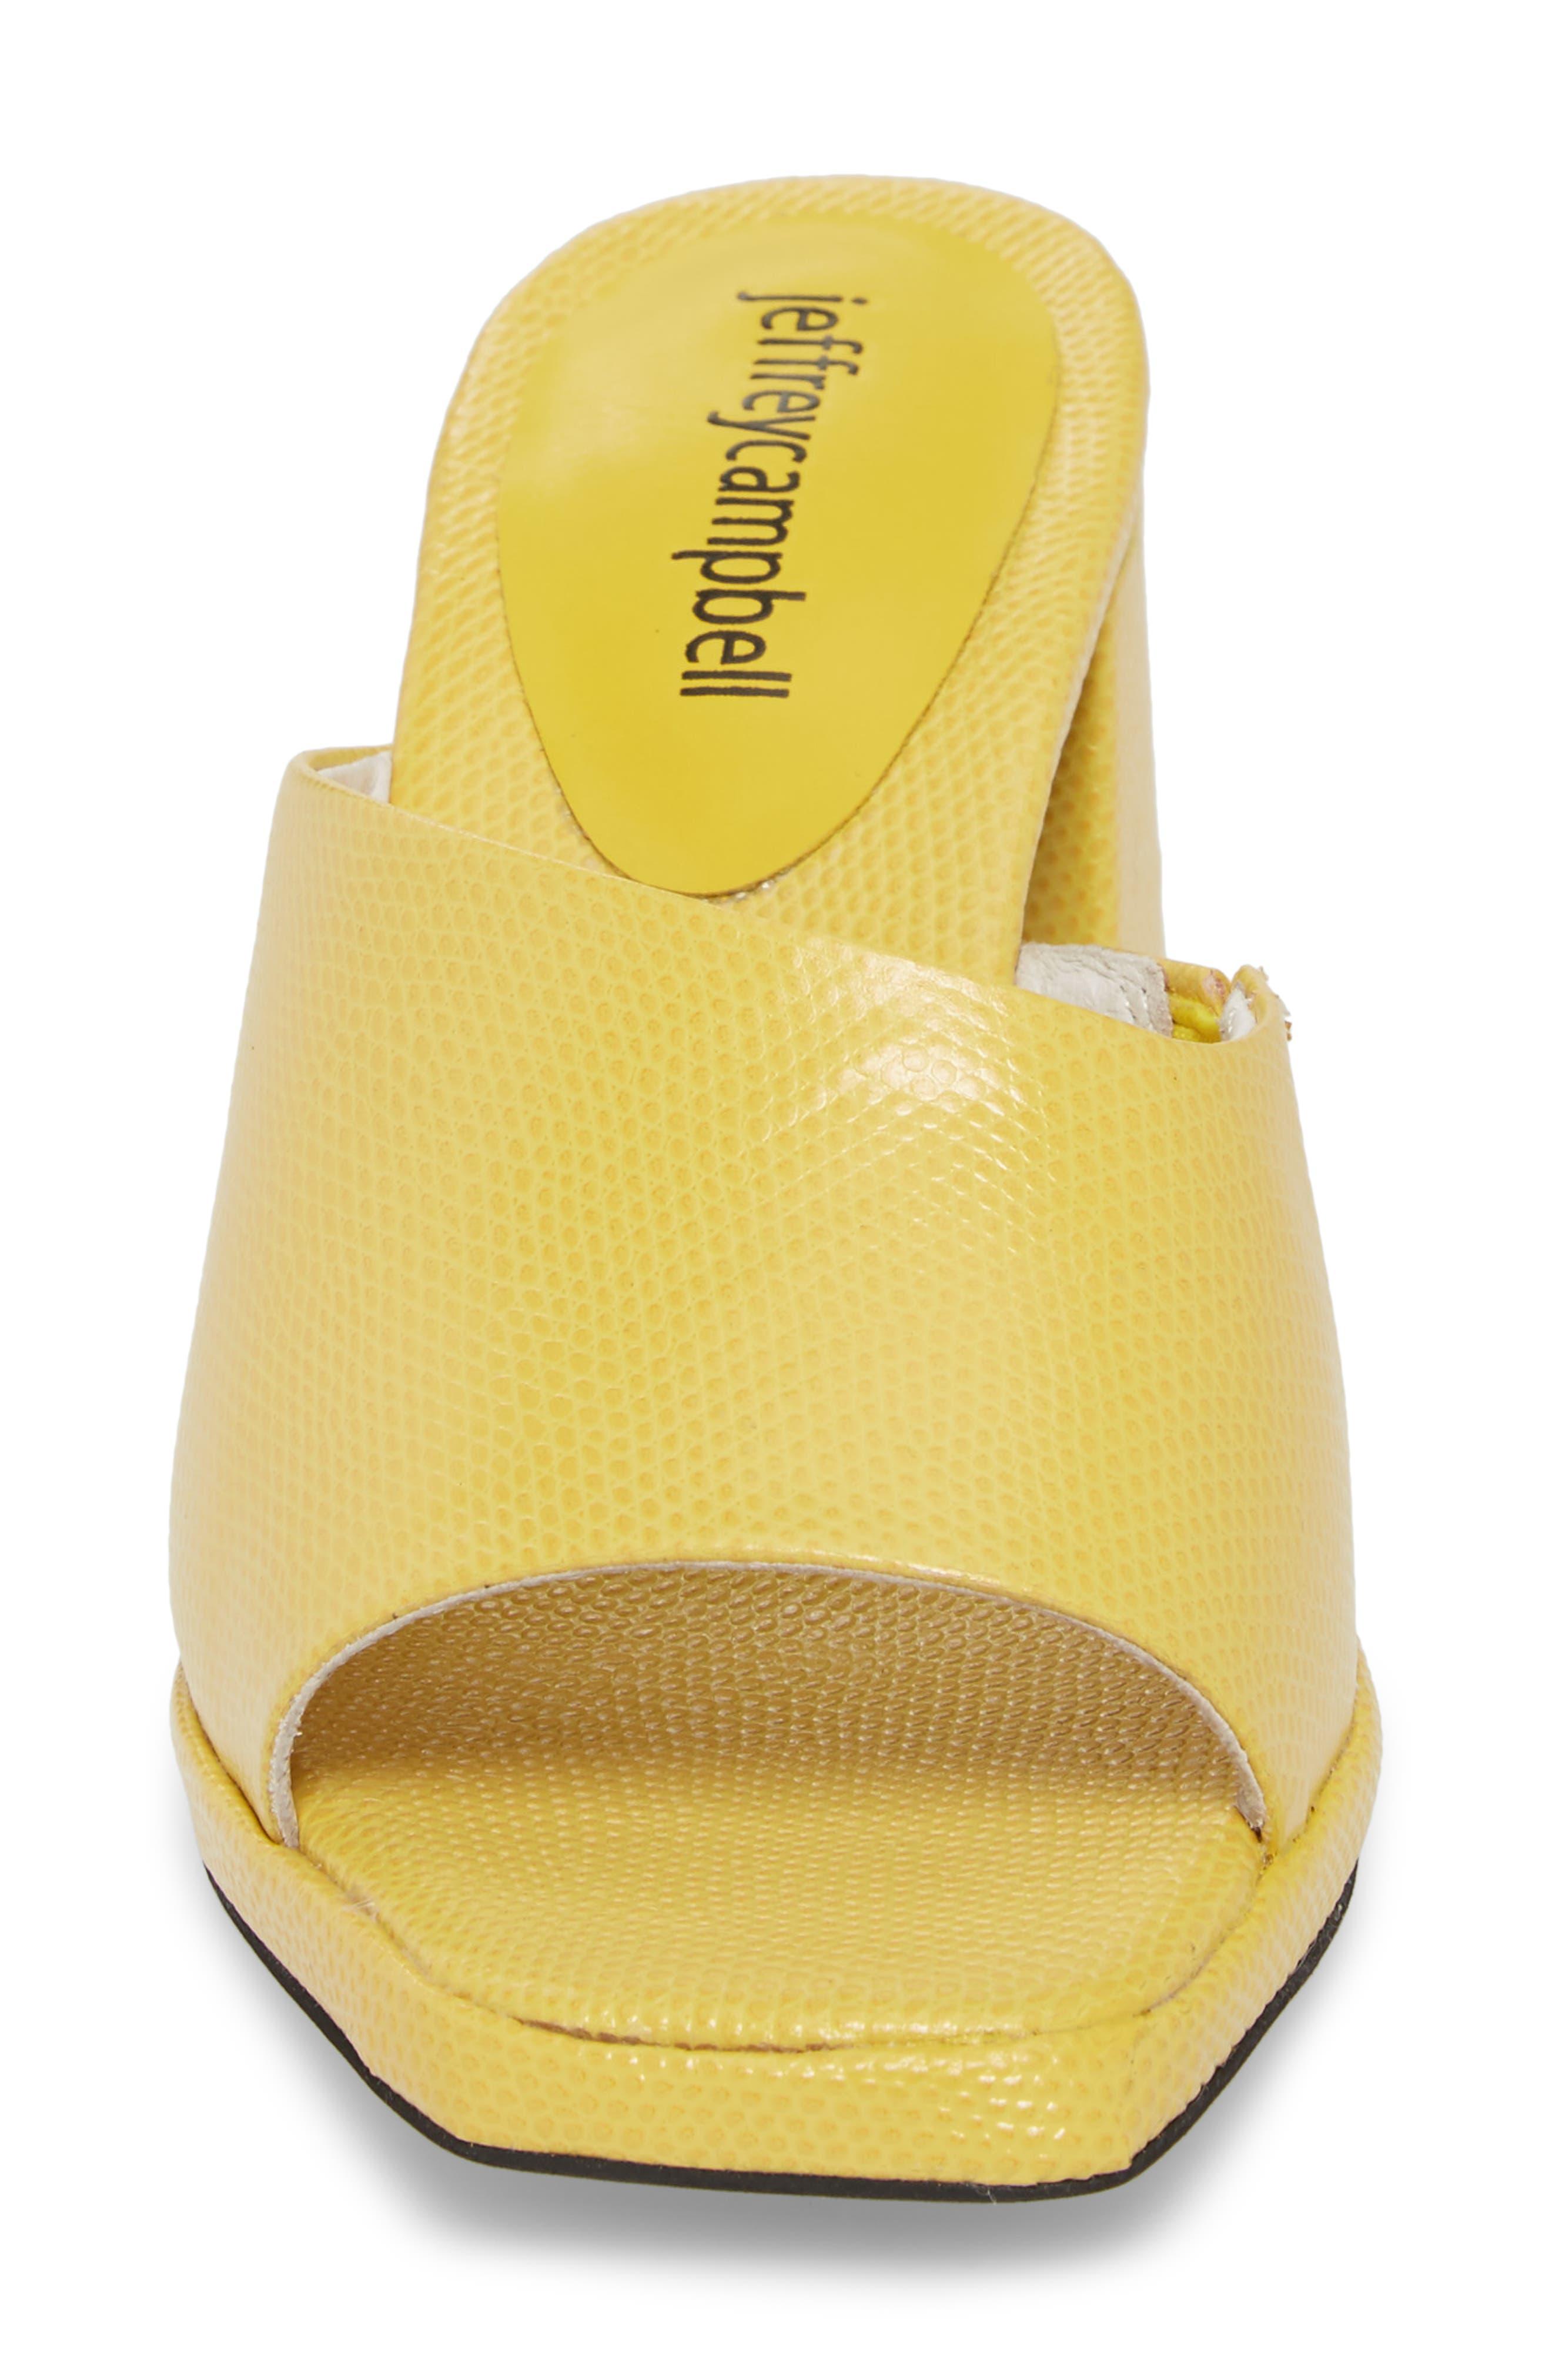 Suzuci Sandal,                             Alternate thumbnail 4, color,                             Yellow Leather